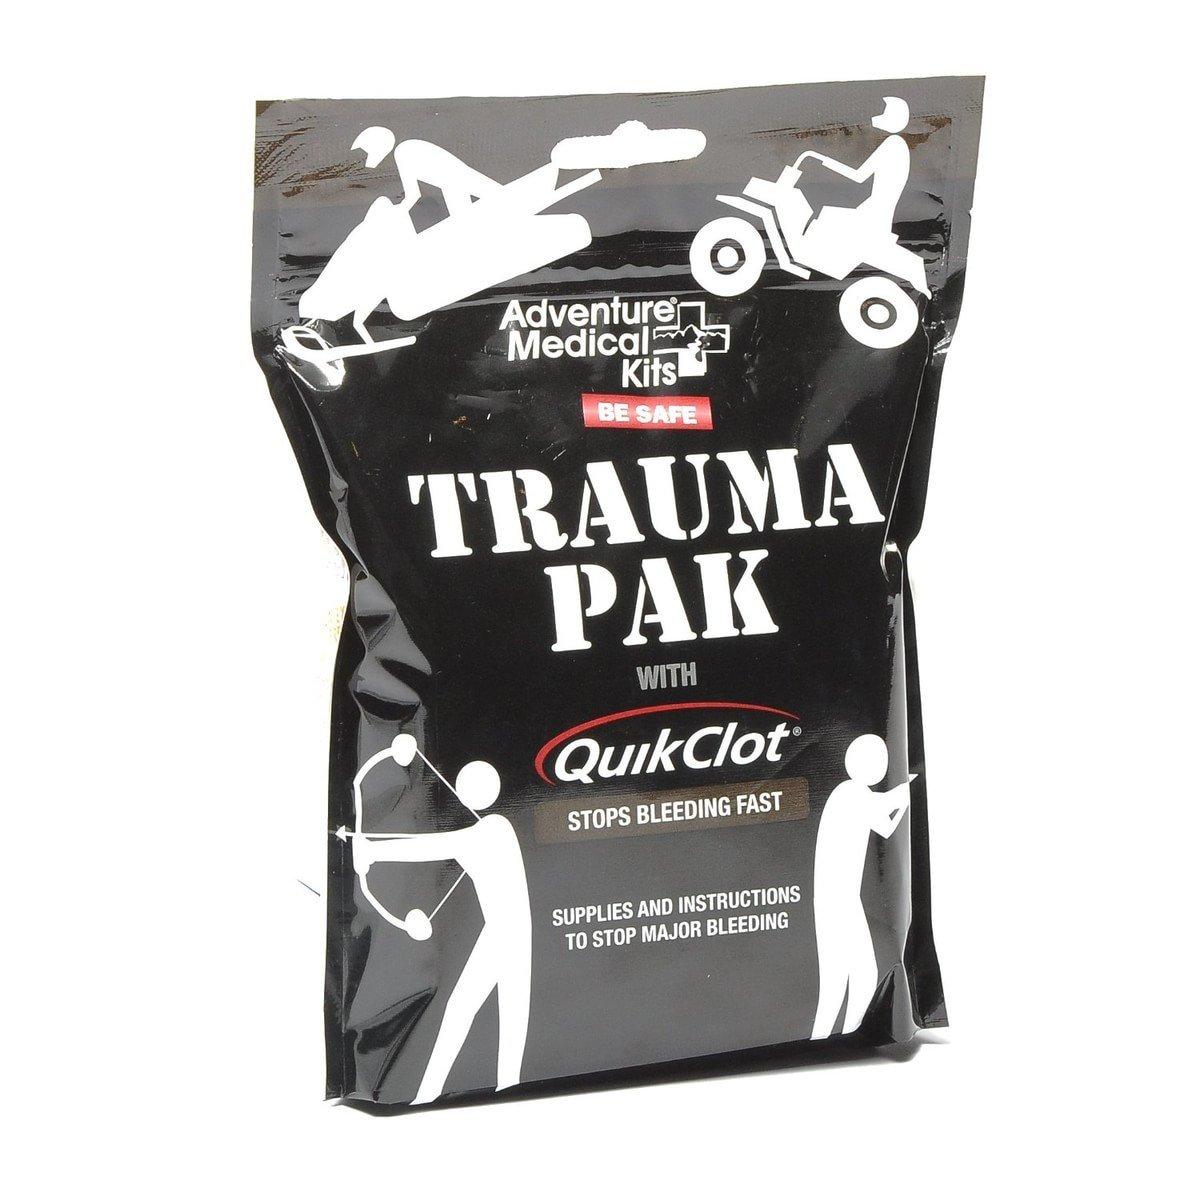 Adventure Medical Kits Trauma Pak First Aid Kit with QuikClot Advanced Clotting Sponge by Adventure Medical Kits